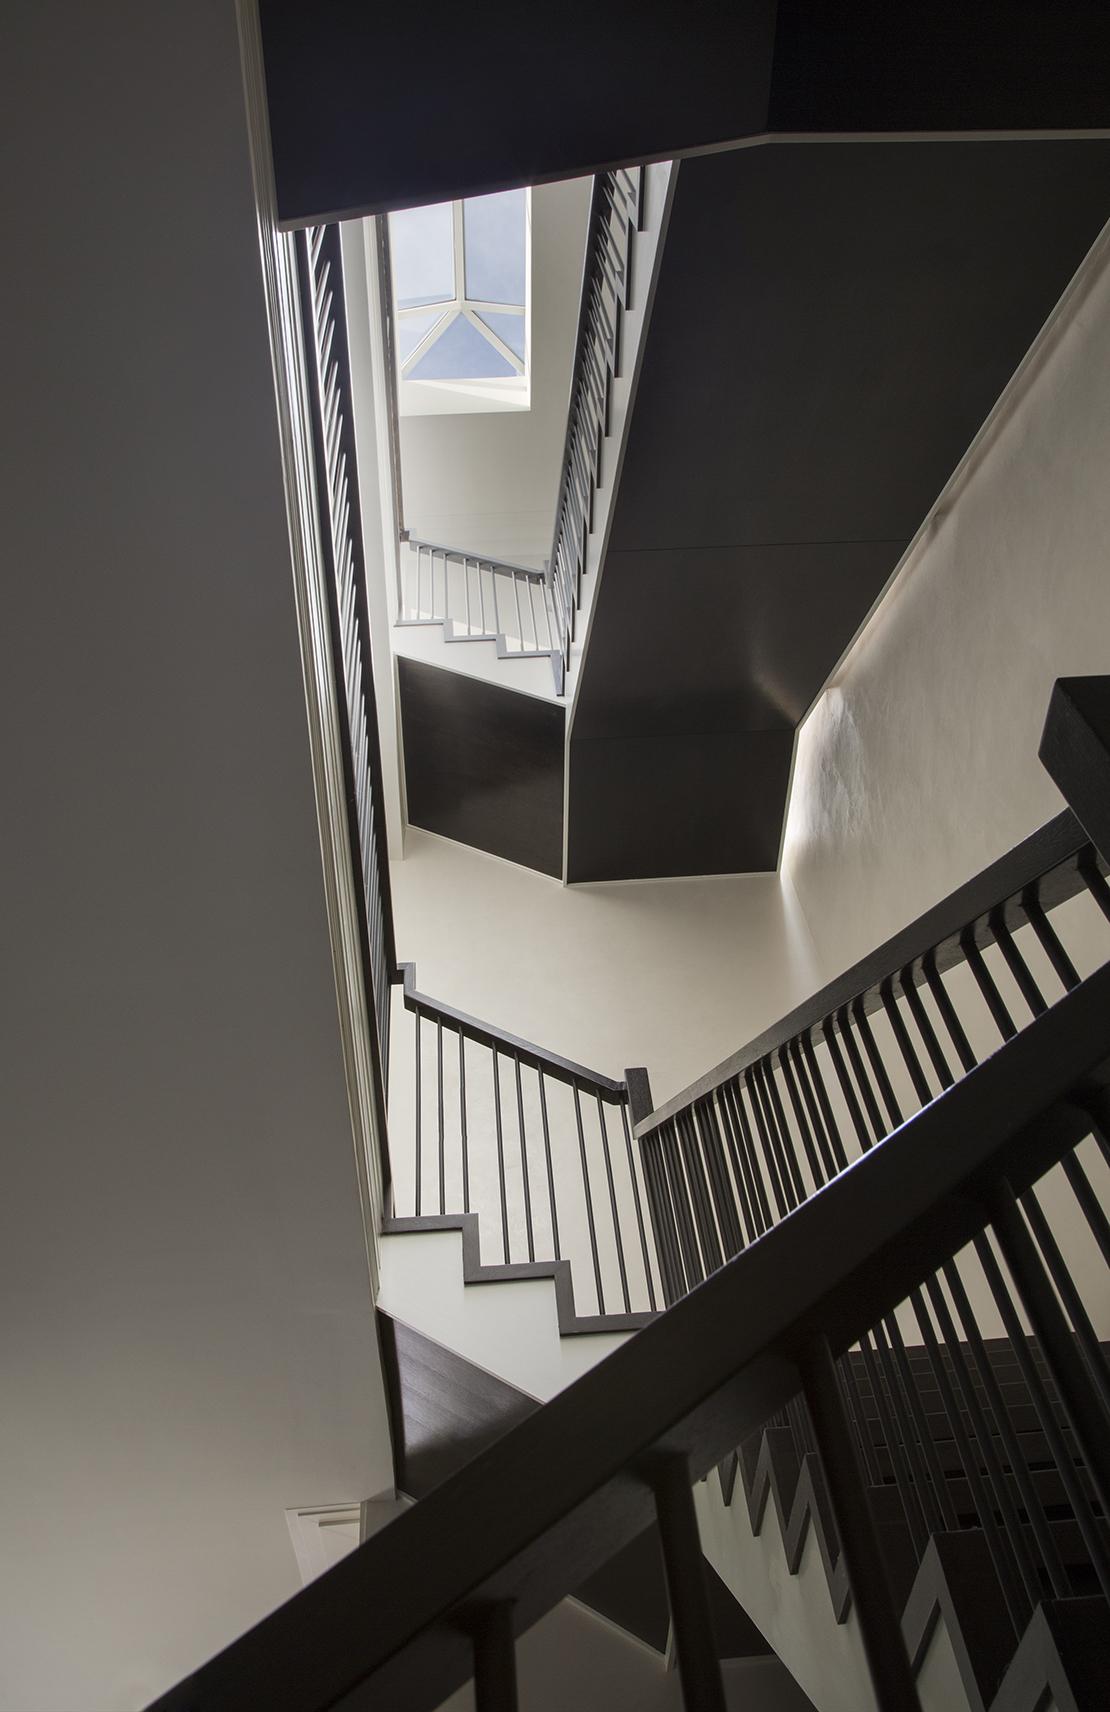 Rajic_Staircase_LR.jpg